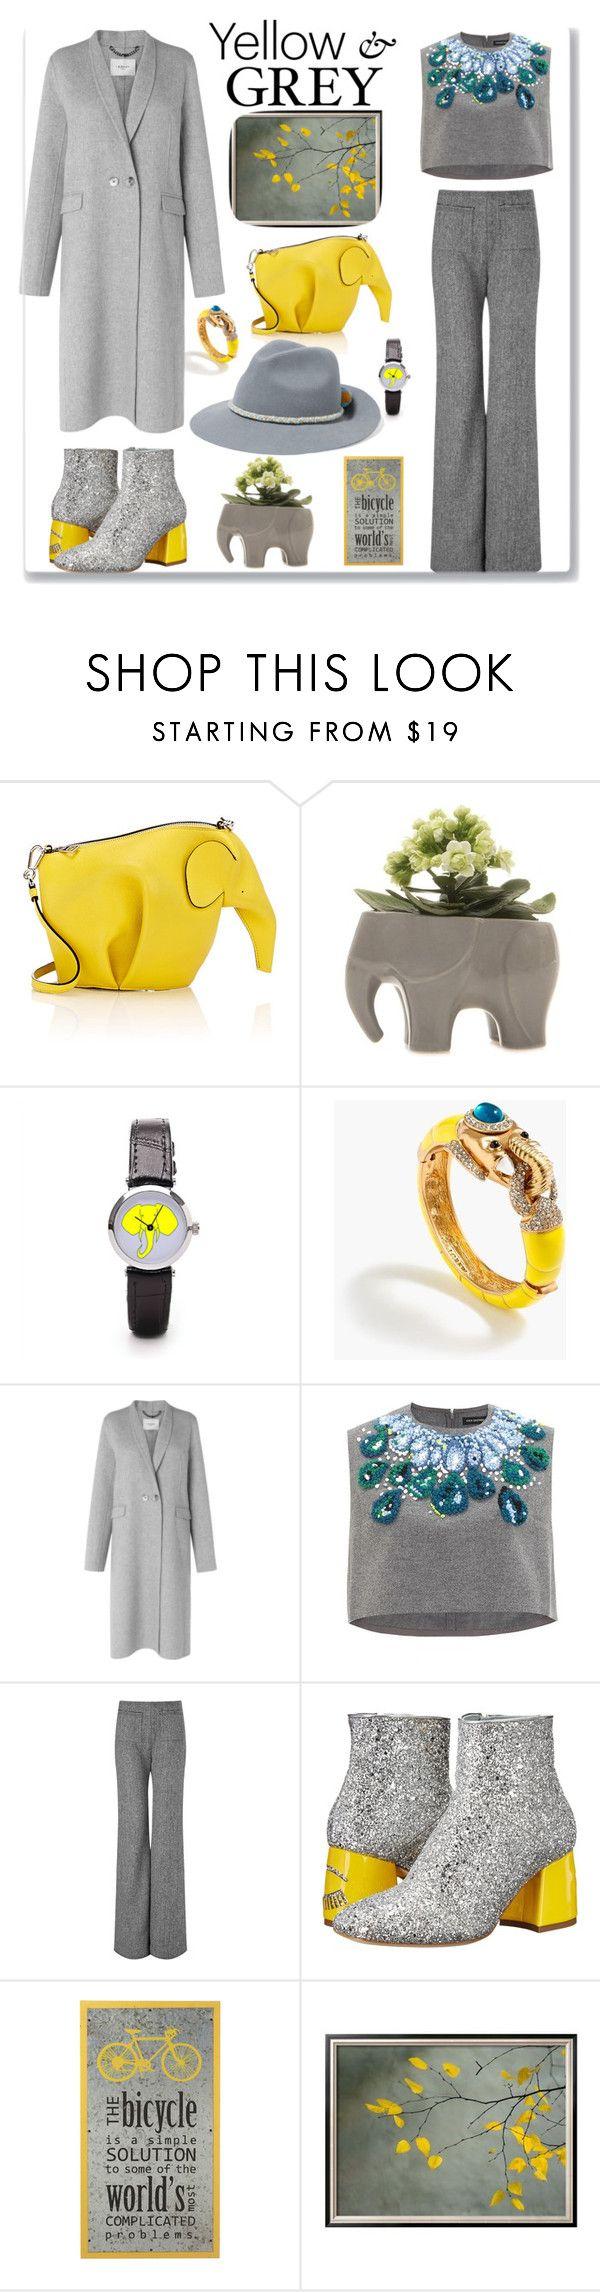 """Yellow & grey"" by dilka-ylibka on Polyvore featuring мода, Loewe, Chive, J.Crew, L.K.Bennett, Vika Gazinskaya, Isa Arfen, Chiara Ferragni и YOSUZI"